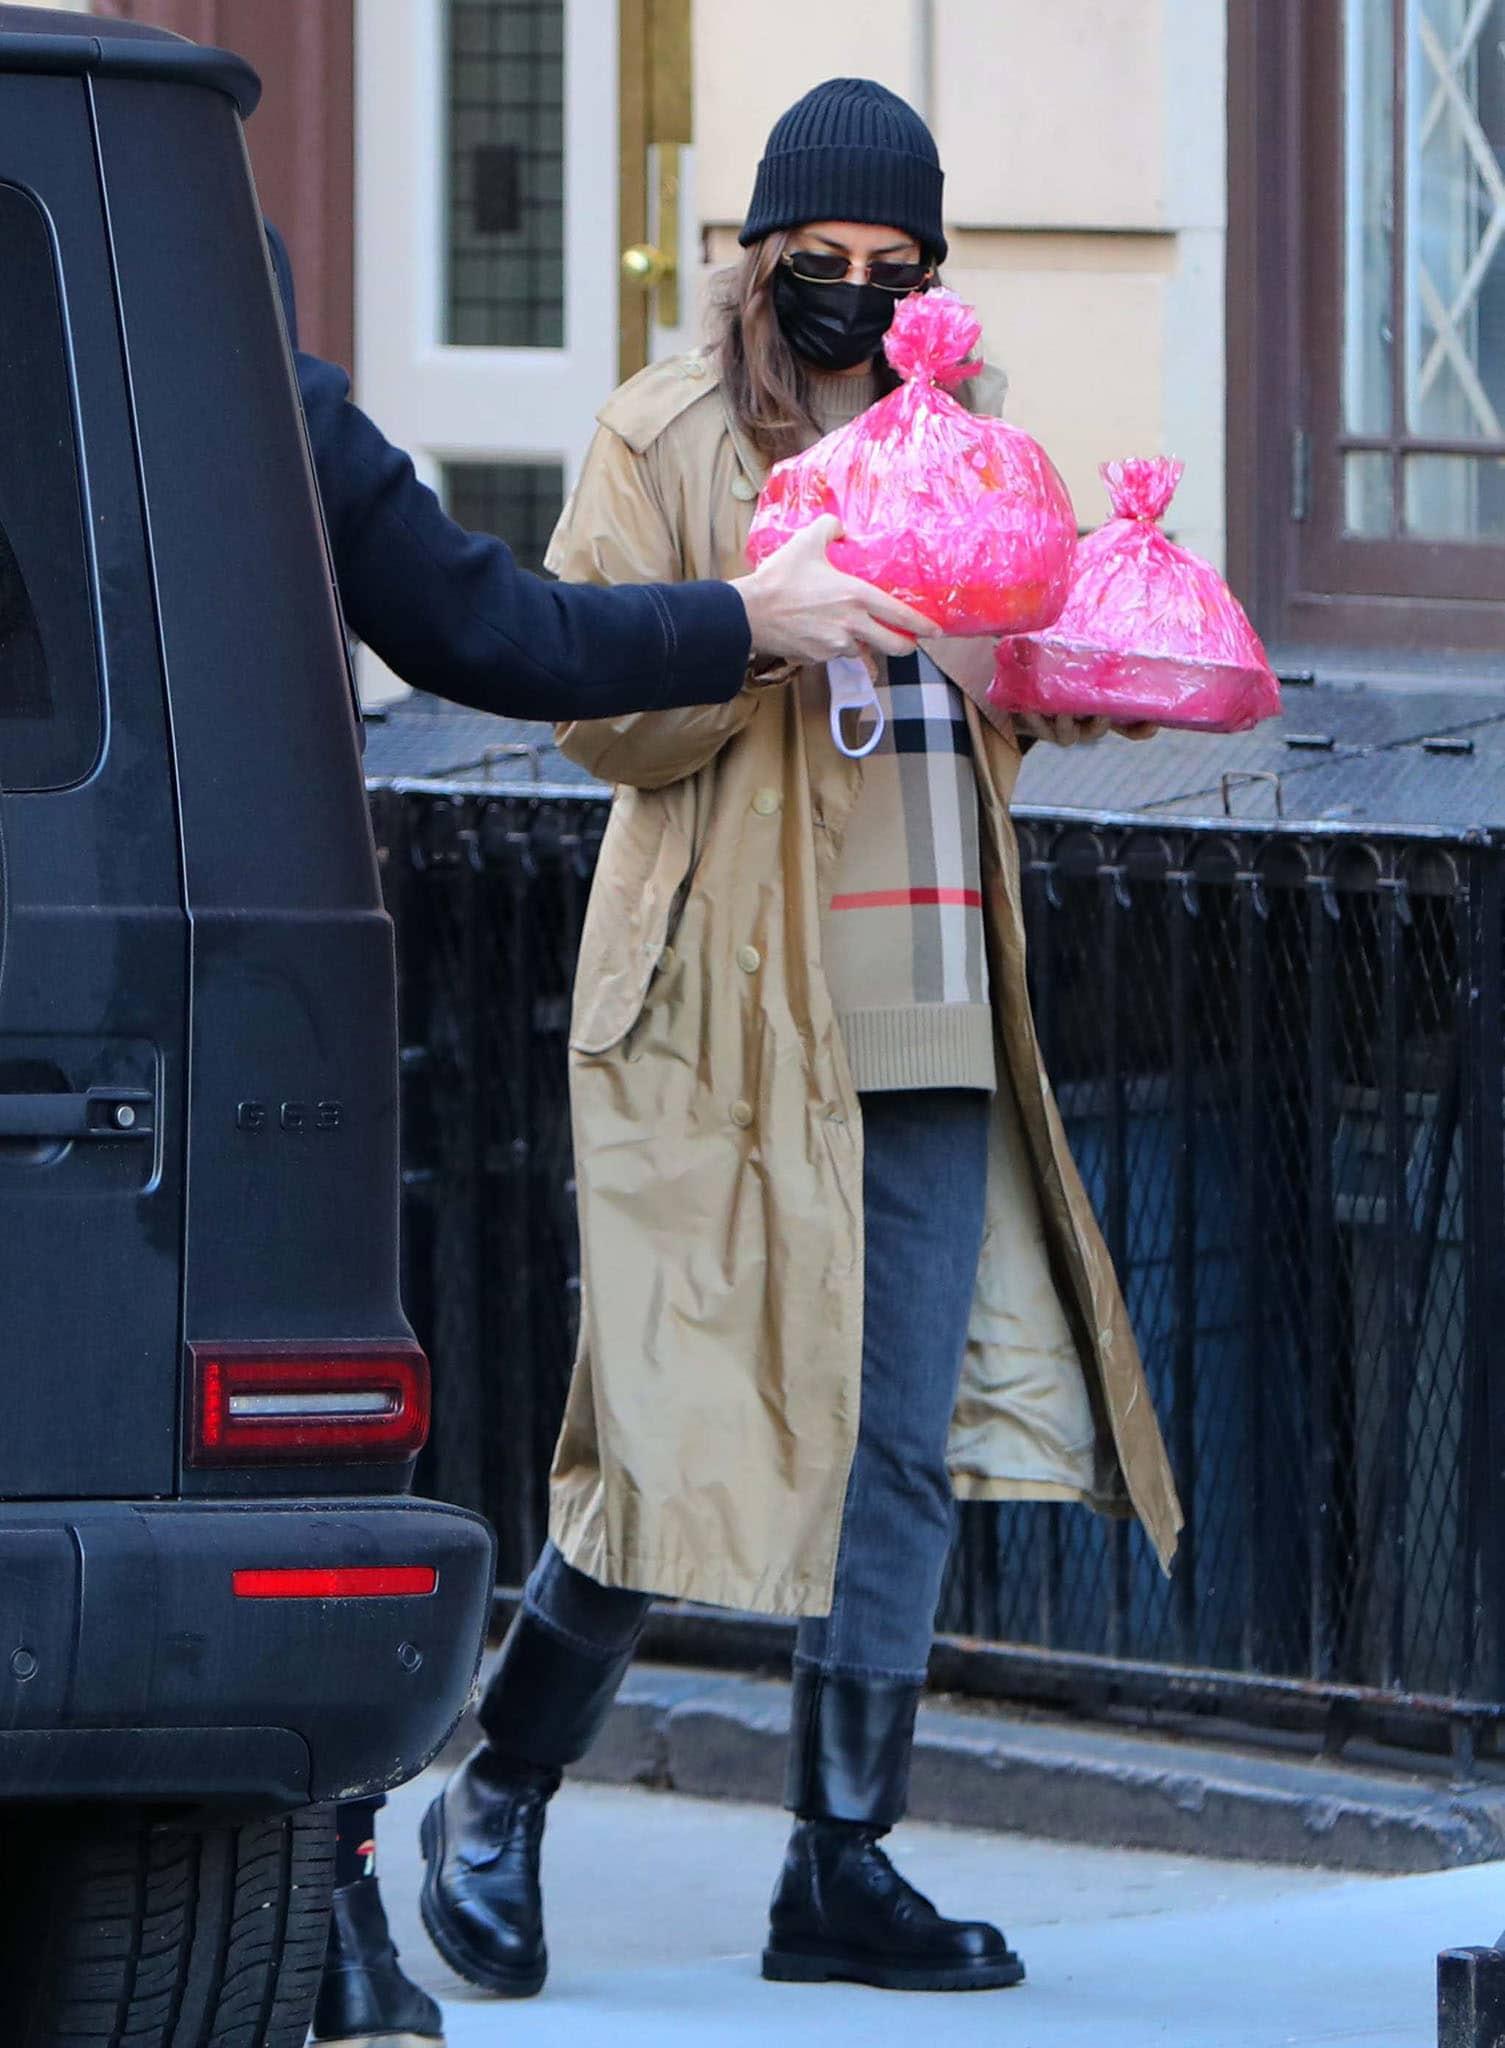 Irina Shayk brings baked goodies for her daughter's birthday celebration